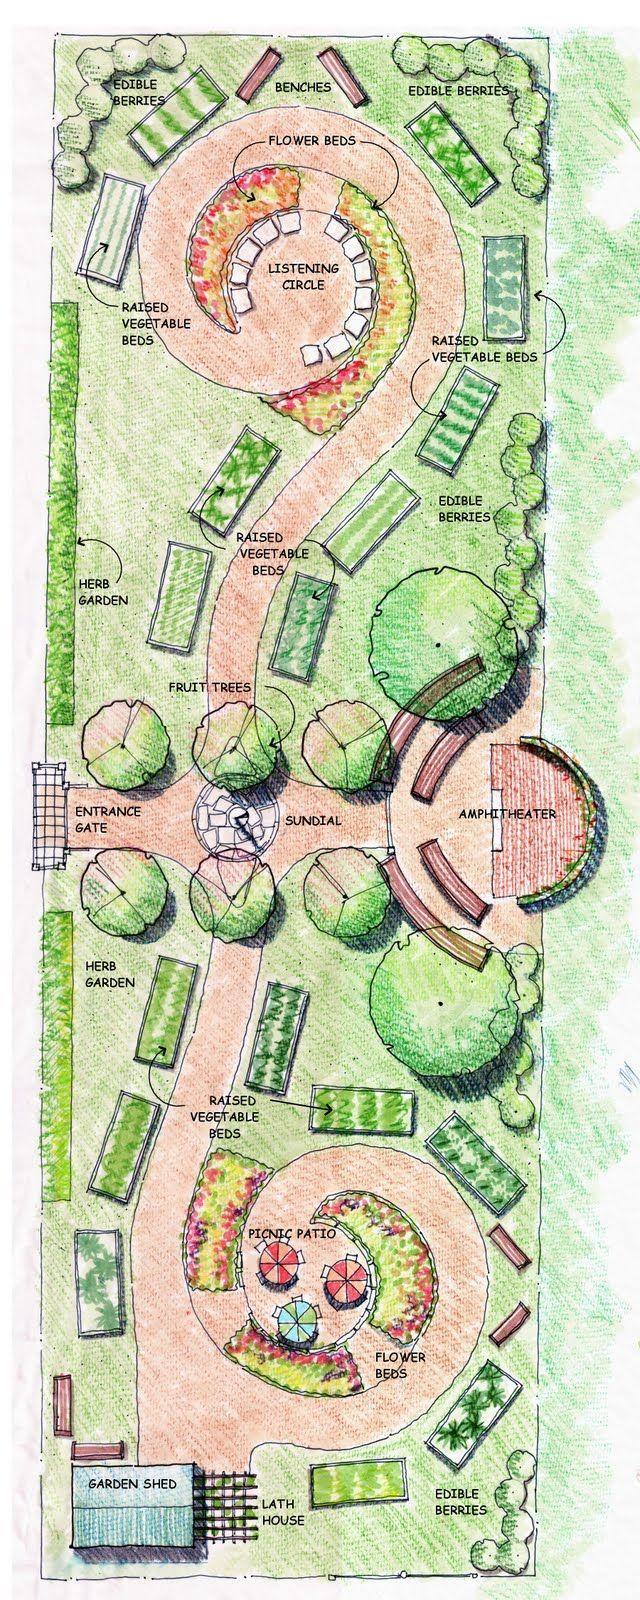 226 best landscape design images on pinterest landscaping design idea the cornucopia project partners with peterborough recreation department to create the peterborough community center garden